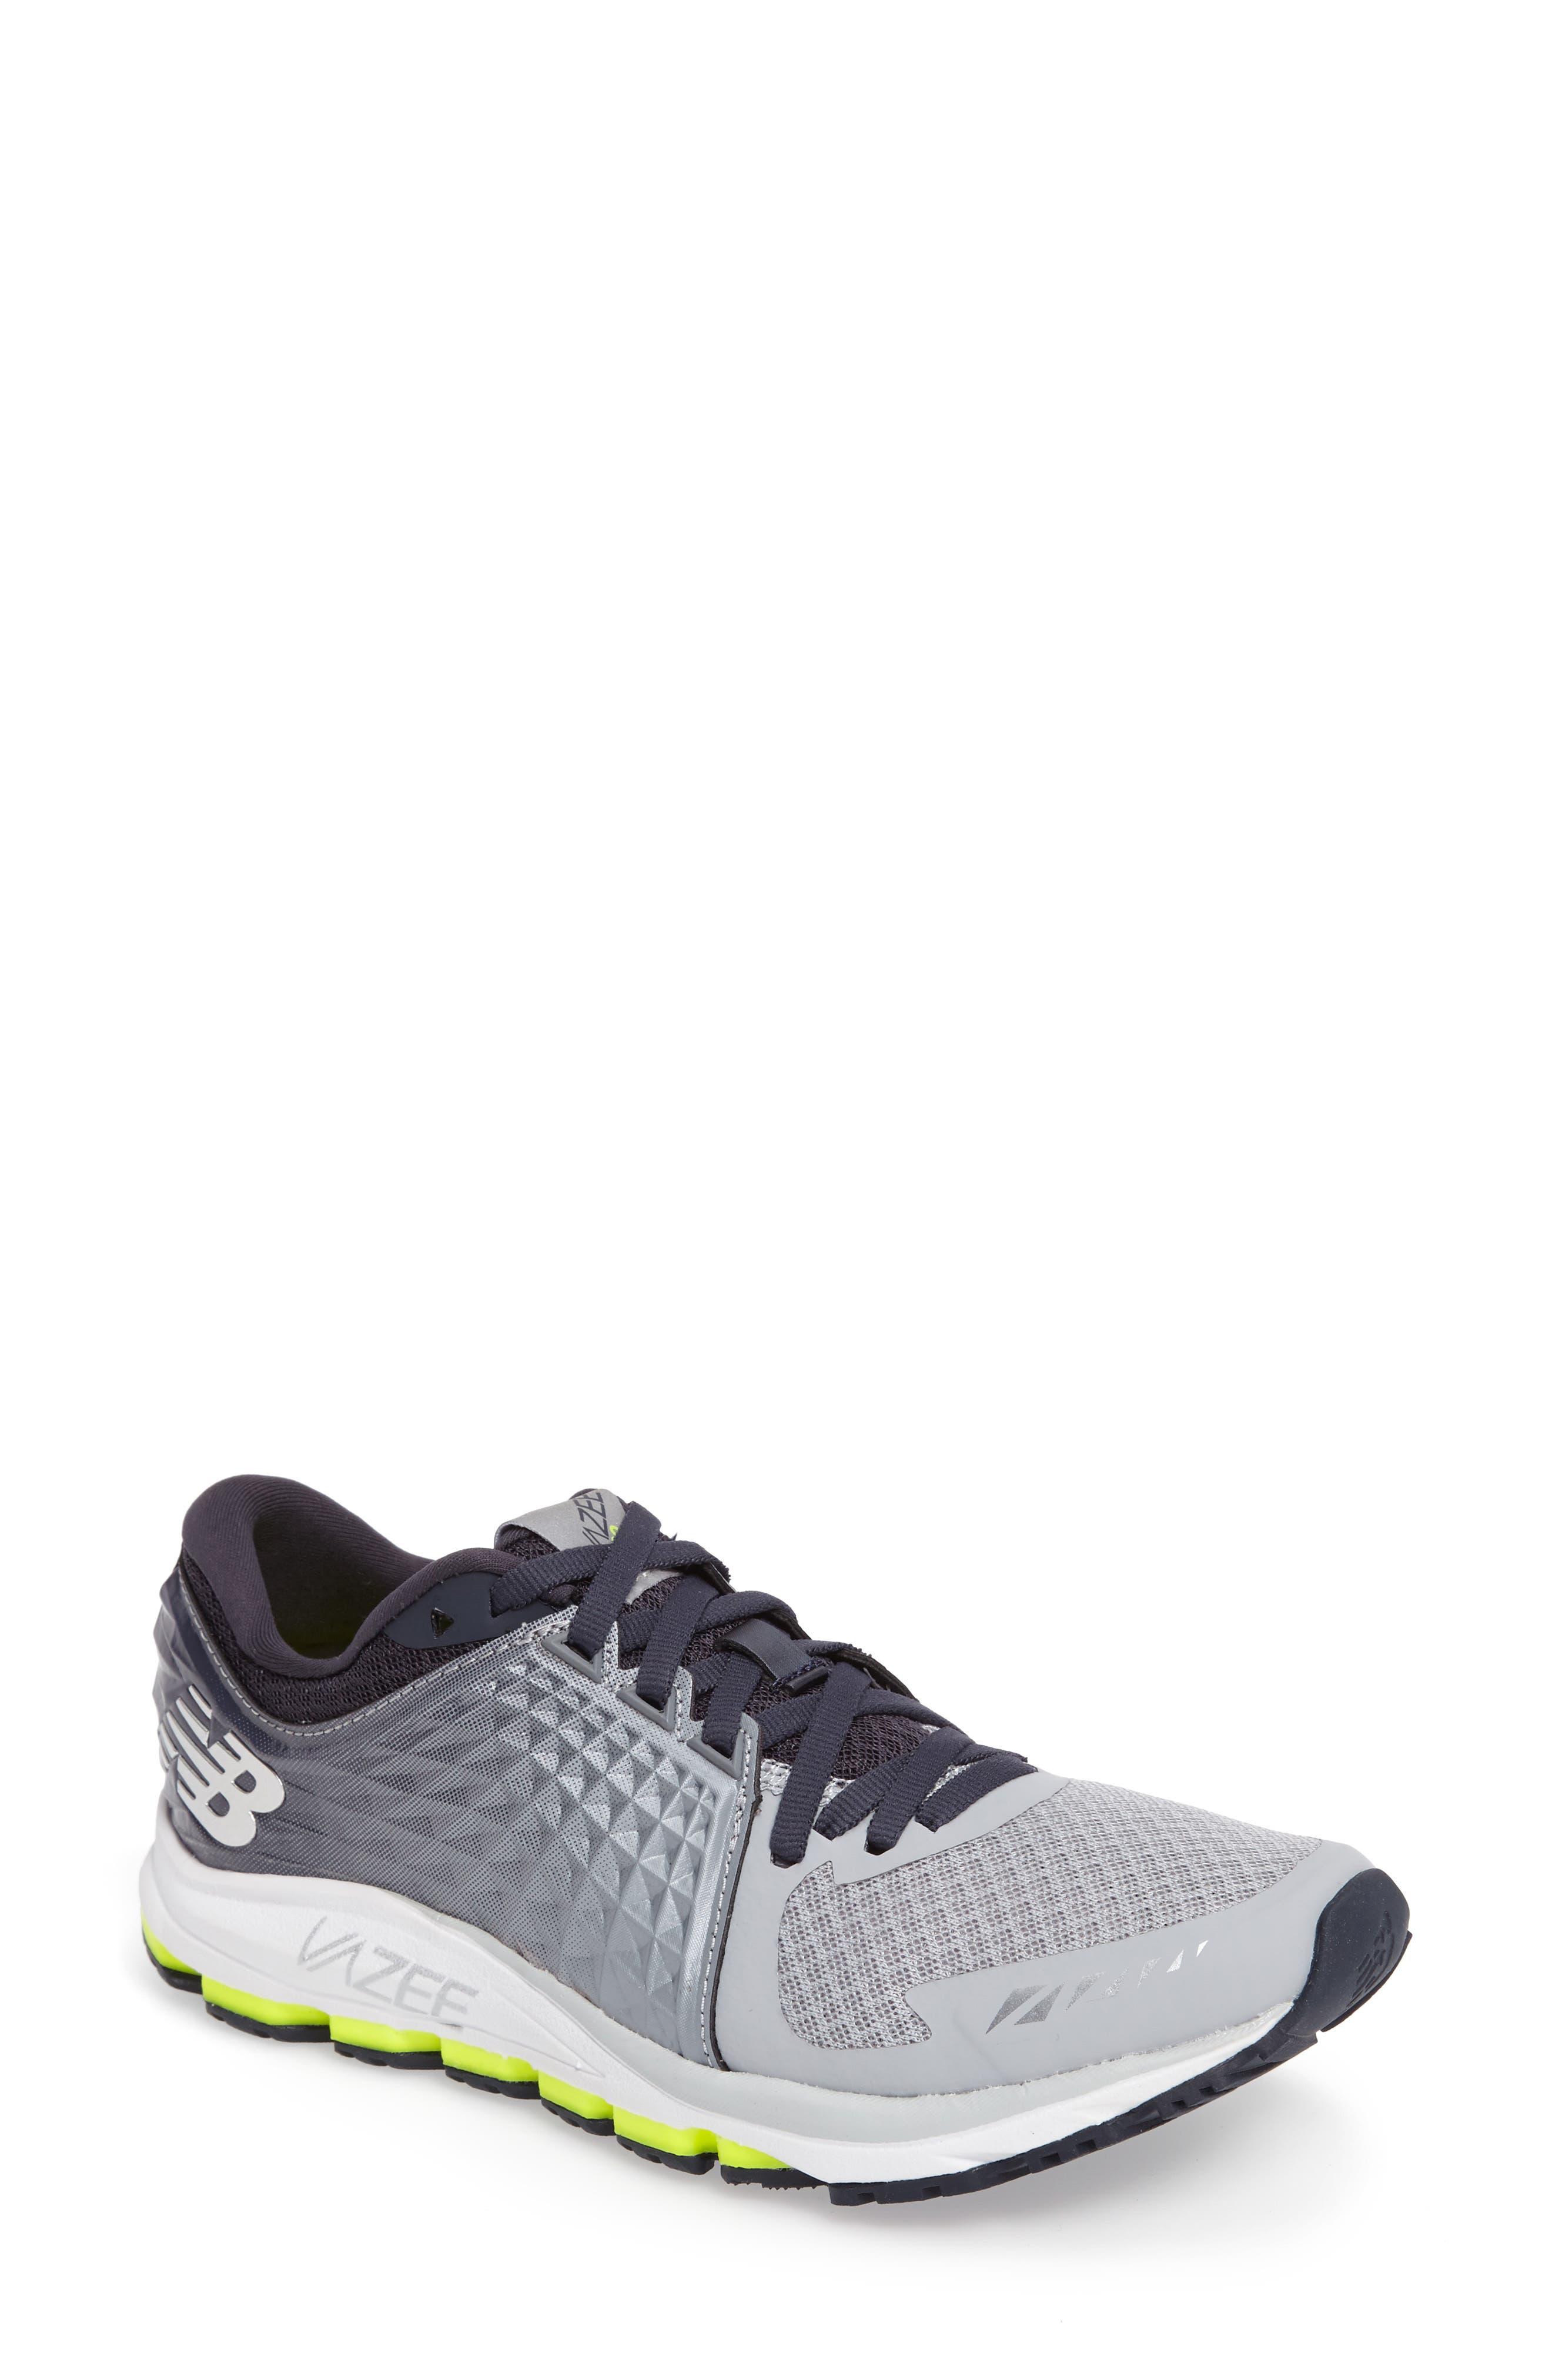 Vazee 2090 Running Shoe,                         Main,                         color, 030